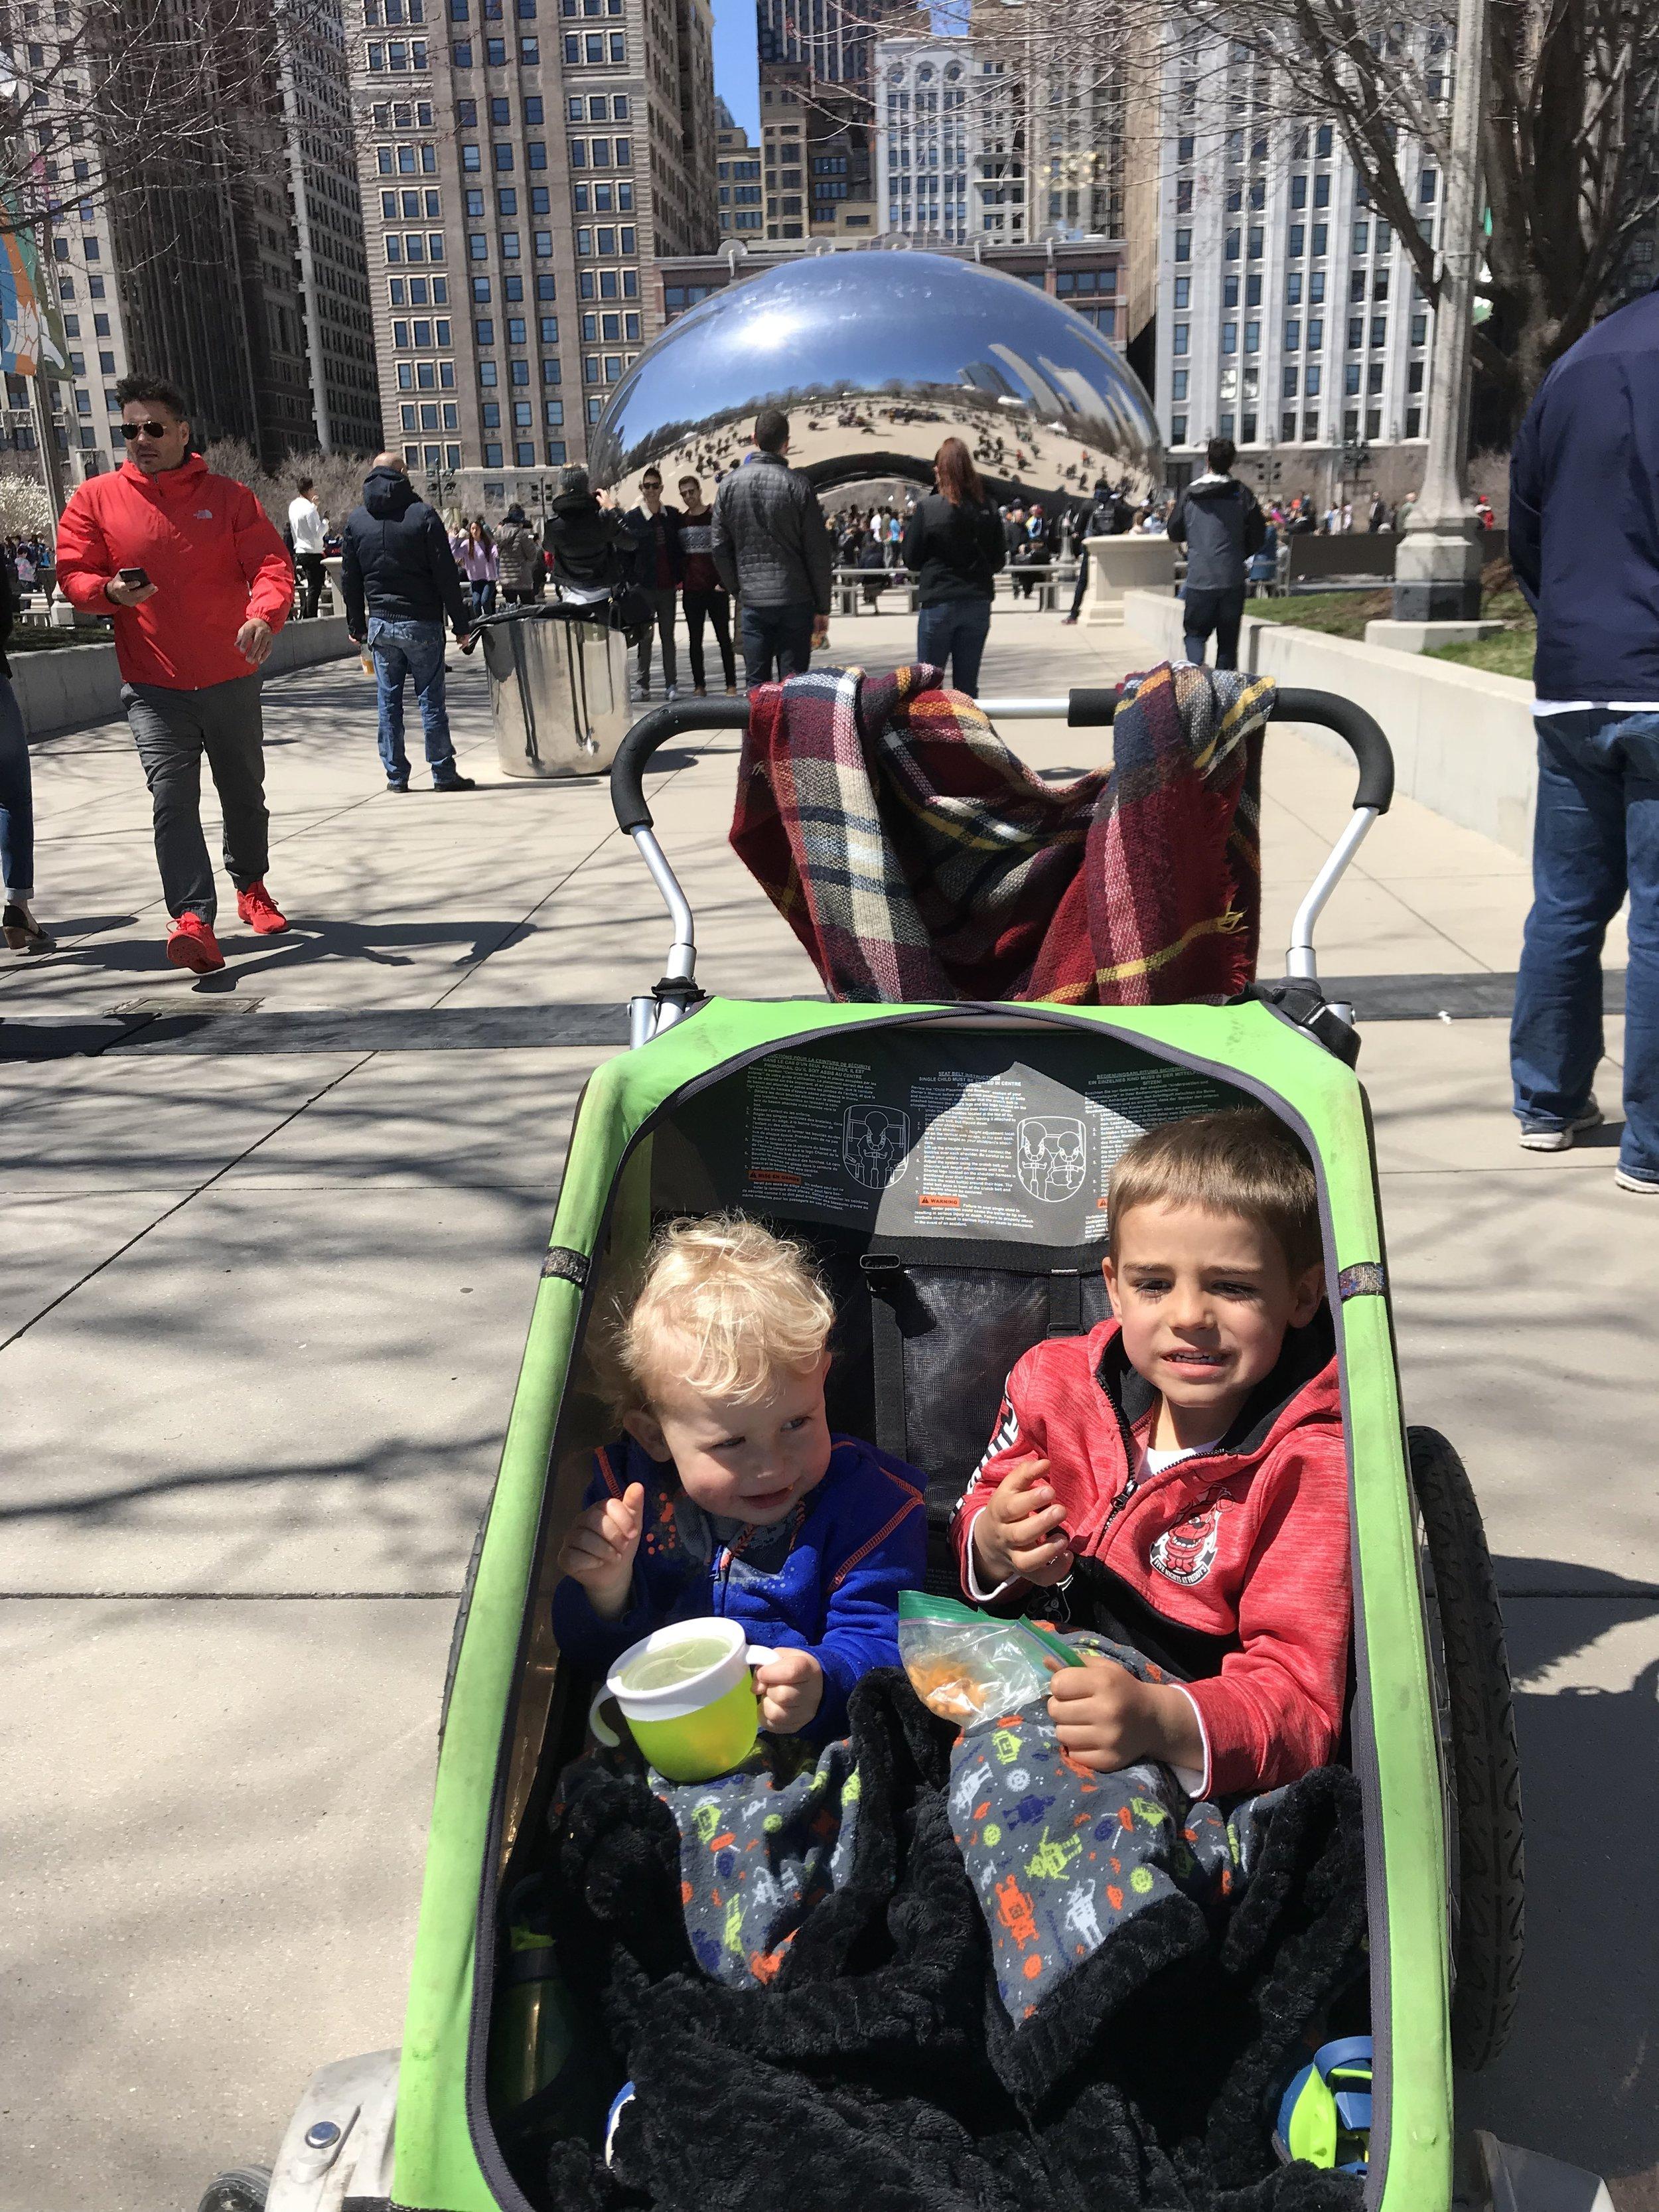 Bean bros   Chicago, IL   April 2018